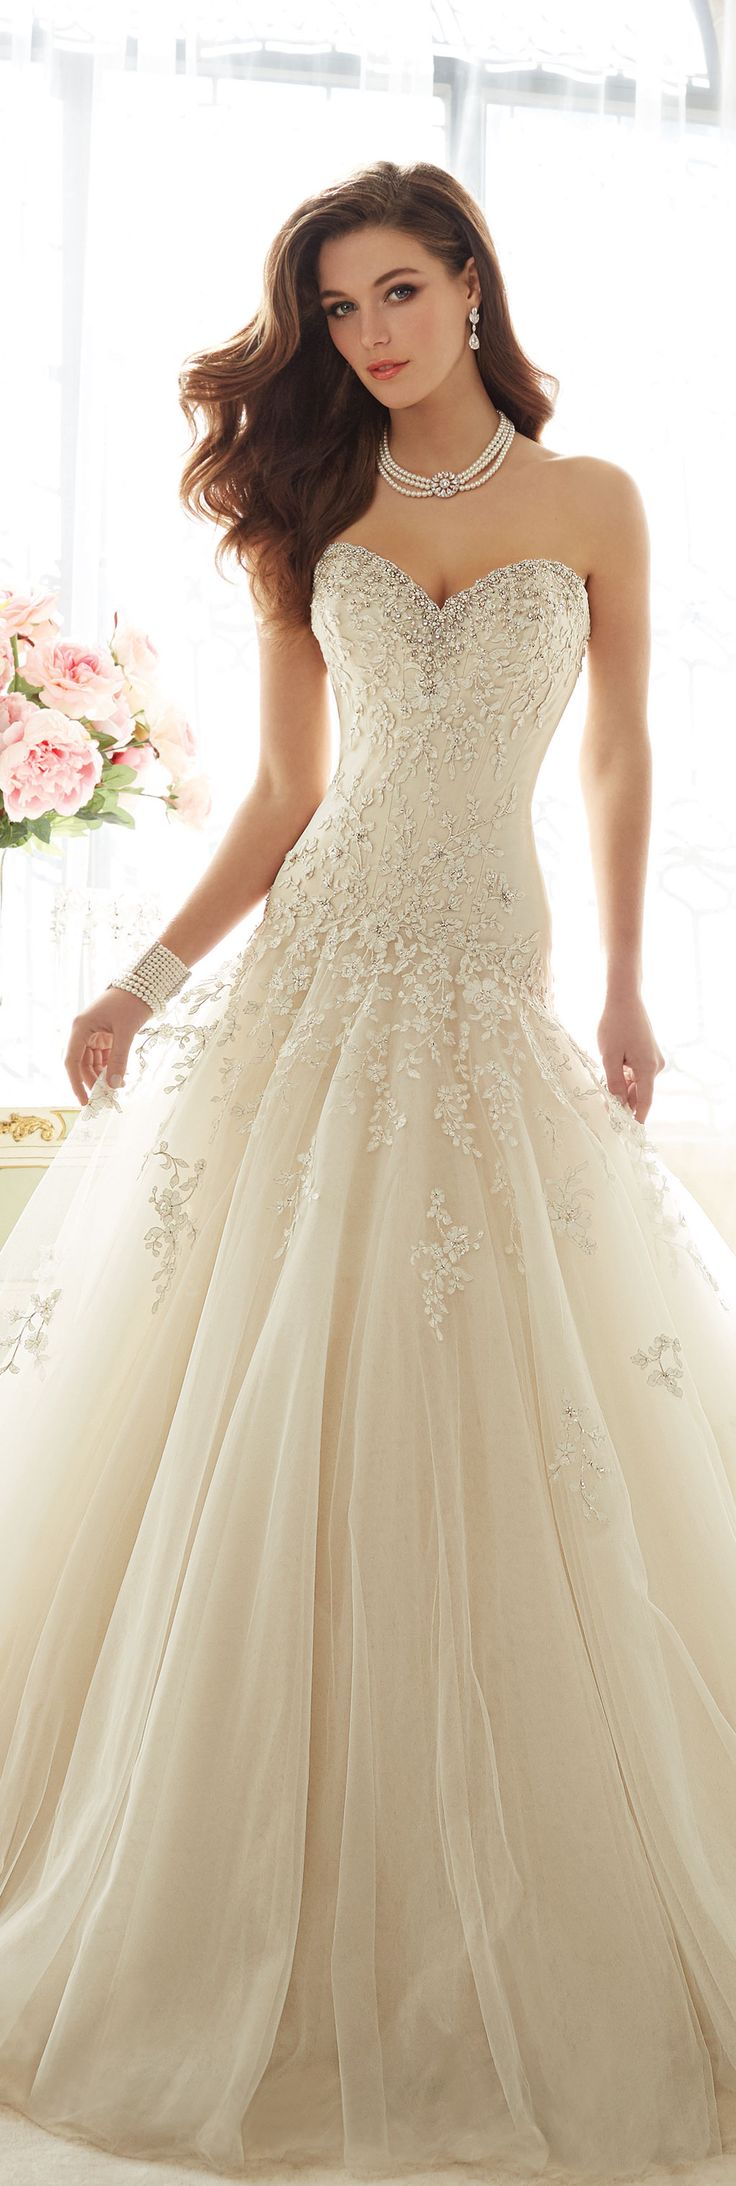 The Sophia Tolli Spring 2016 Wedding Dress Collection - Style No. Y11637 - Marquesa #laceandtulleweddingdress